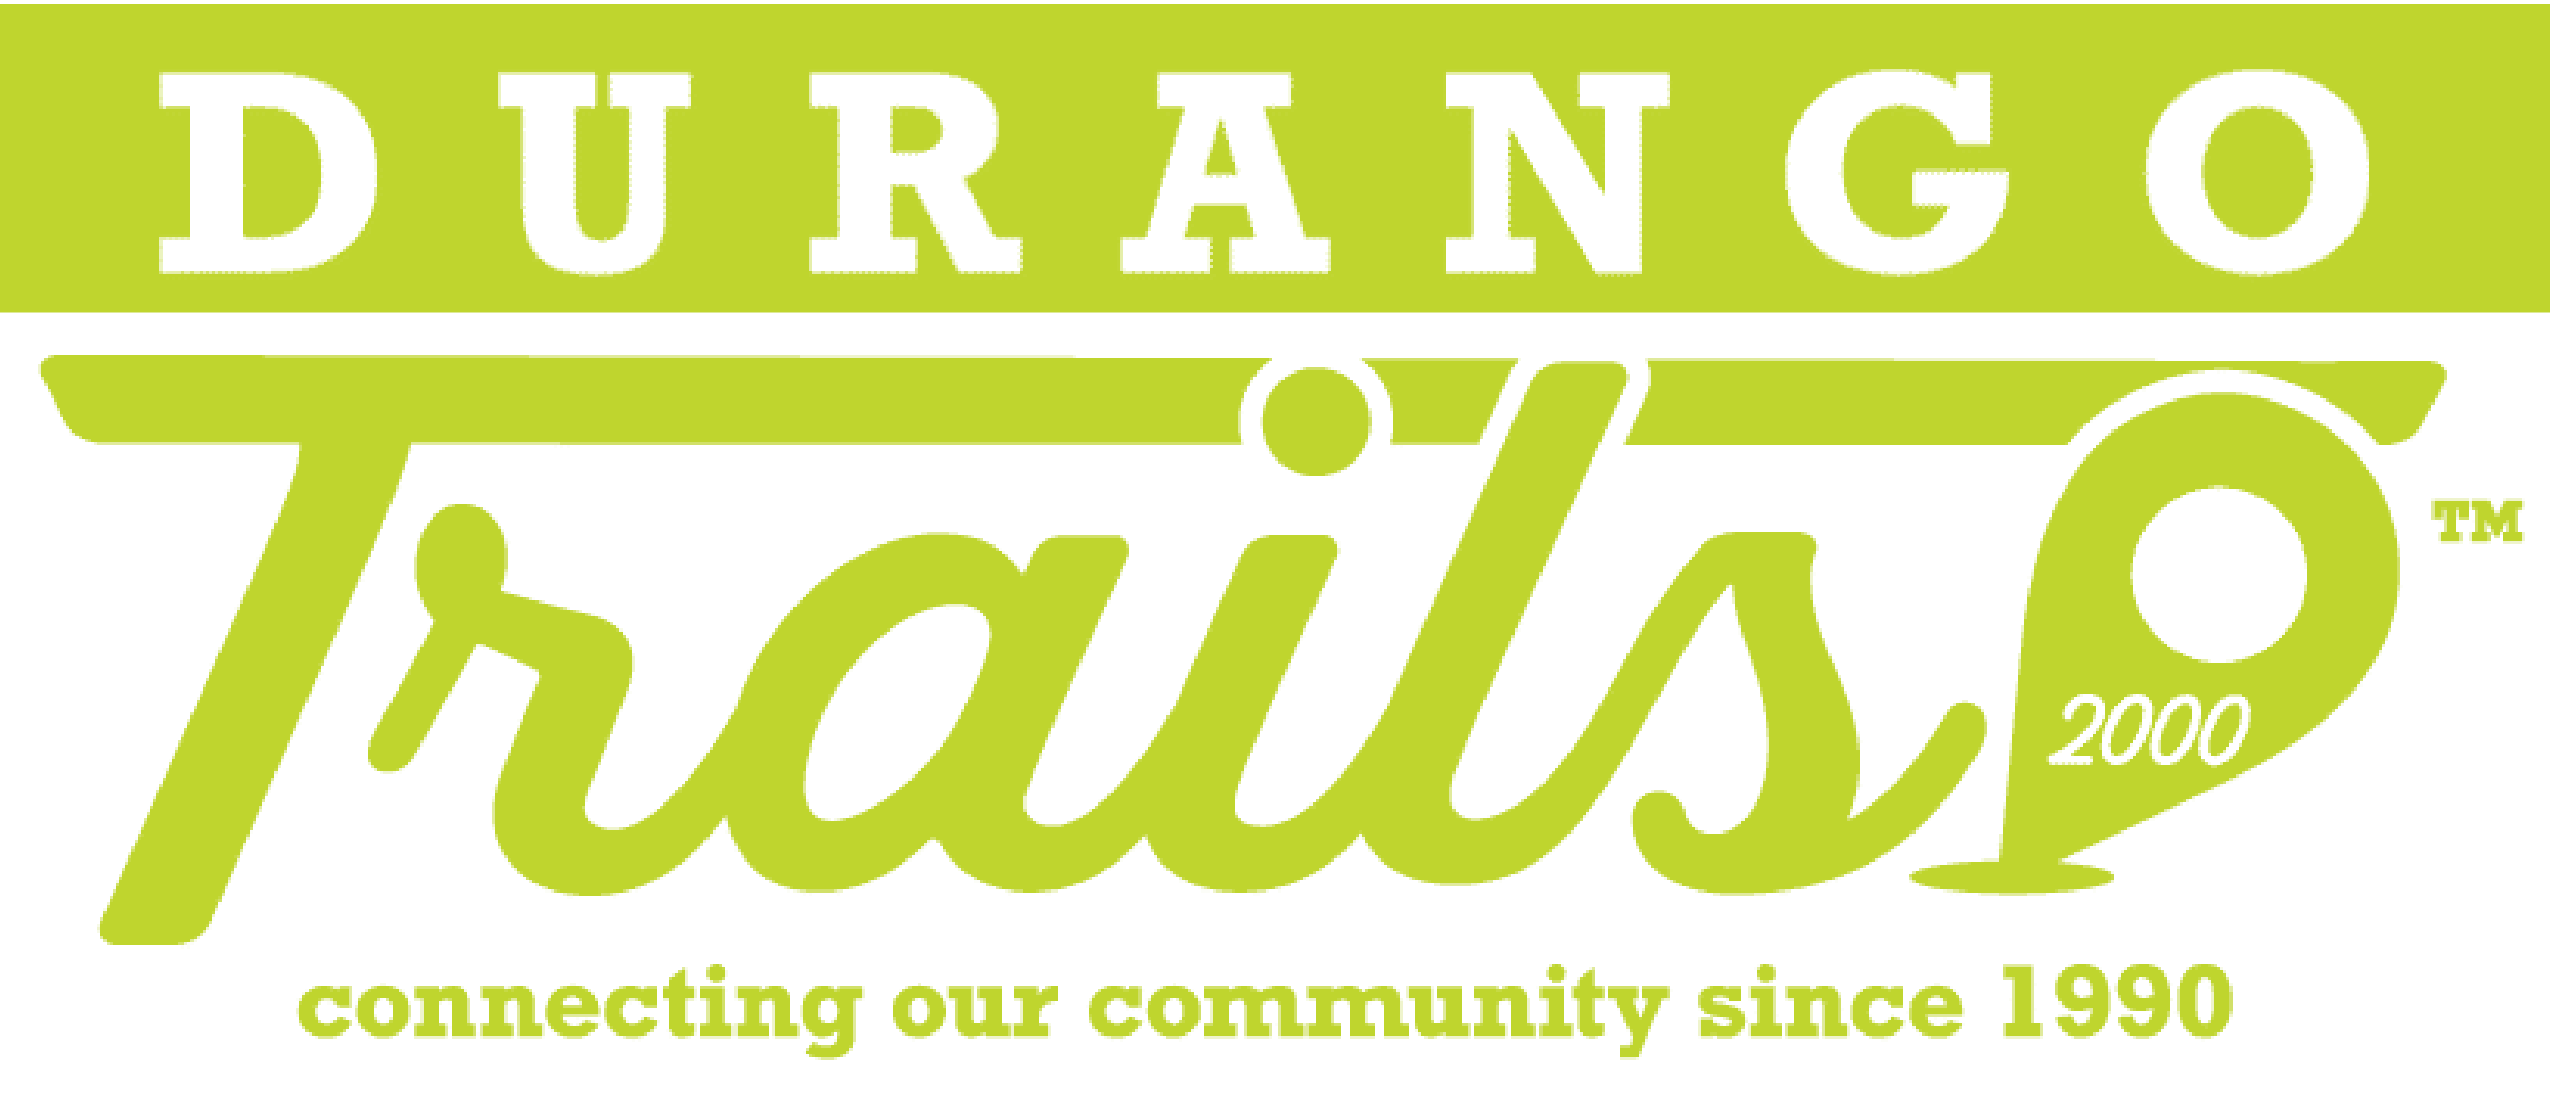 Durango Trails logo